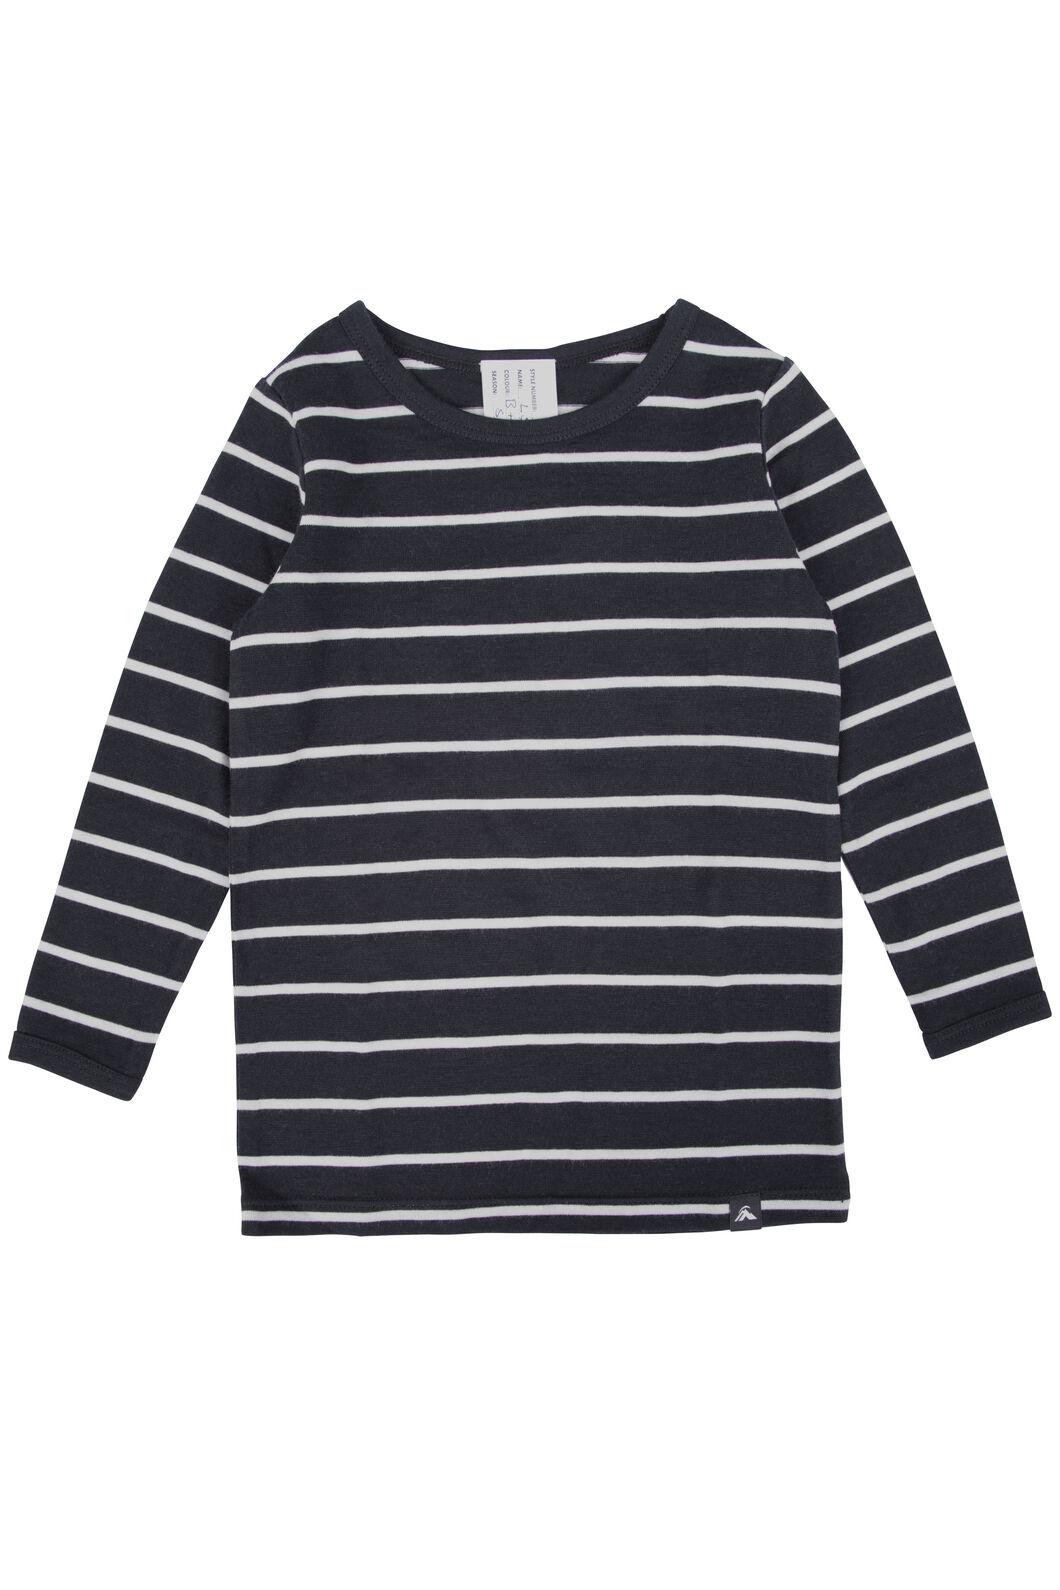 Macpac 150 Merino Long Sleeve Top - Baby, Black/White Stripe, hi-res